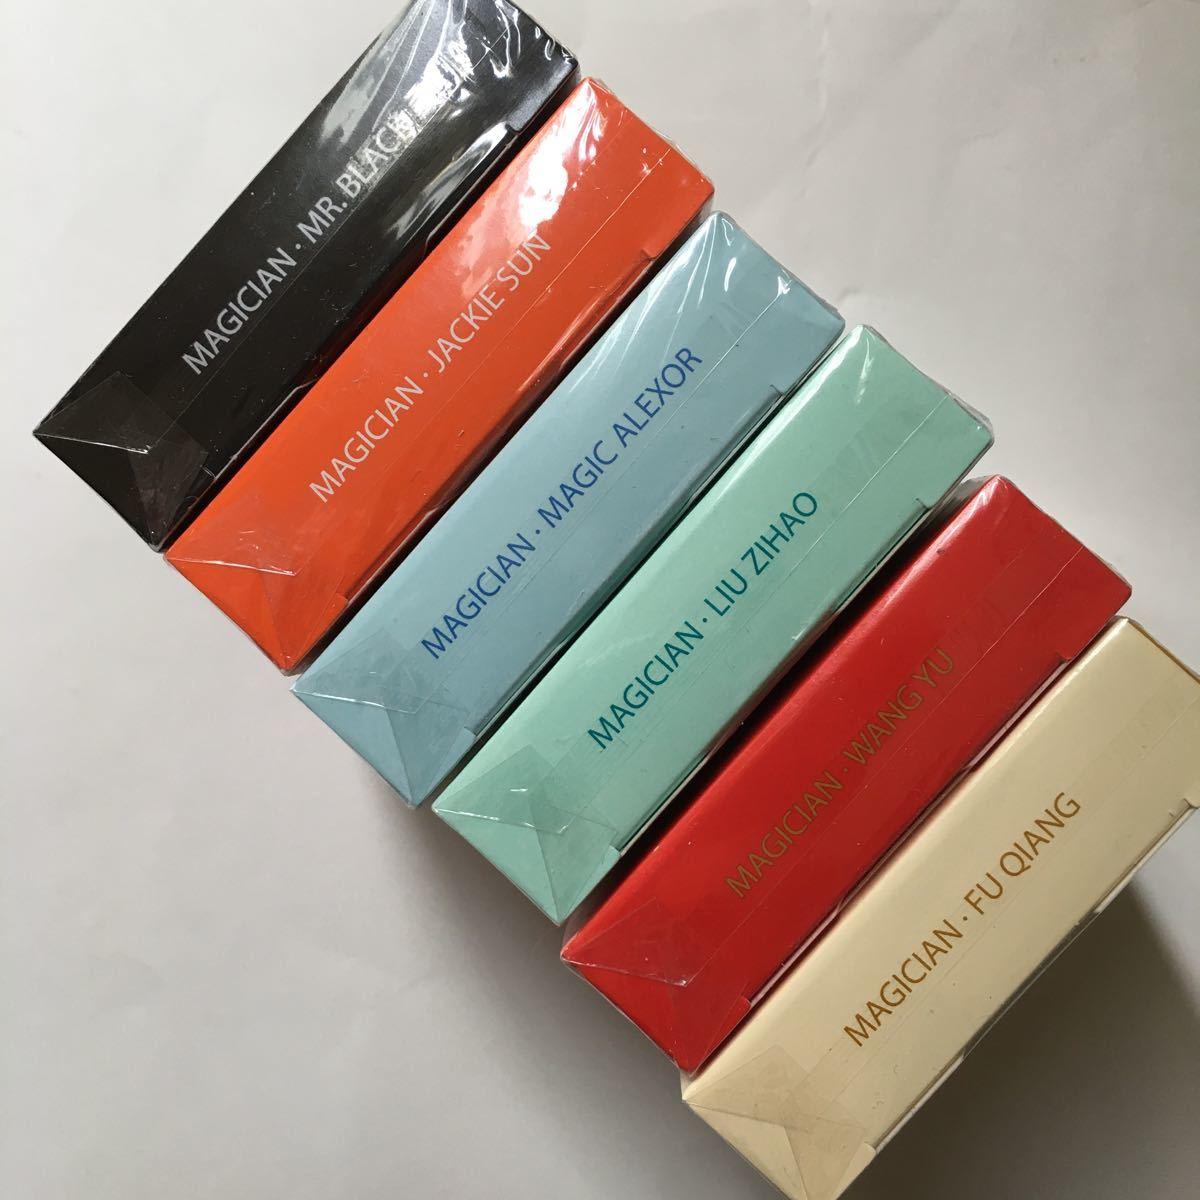 Magic Notebook Deck Bocopo Playing Cards Dai Vernon 新品 6デックセット_画像3